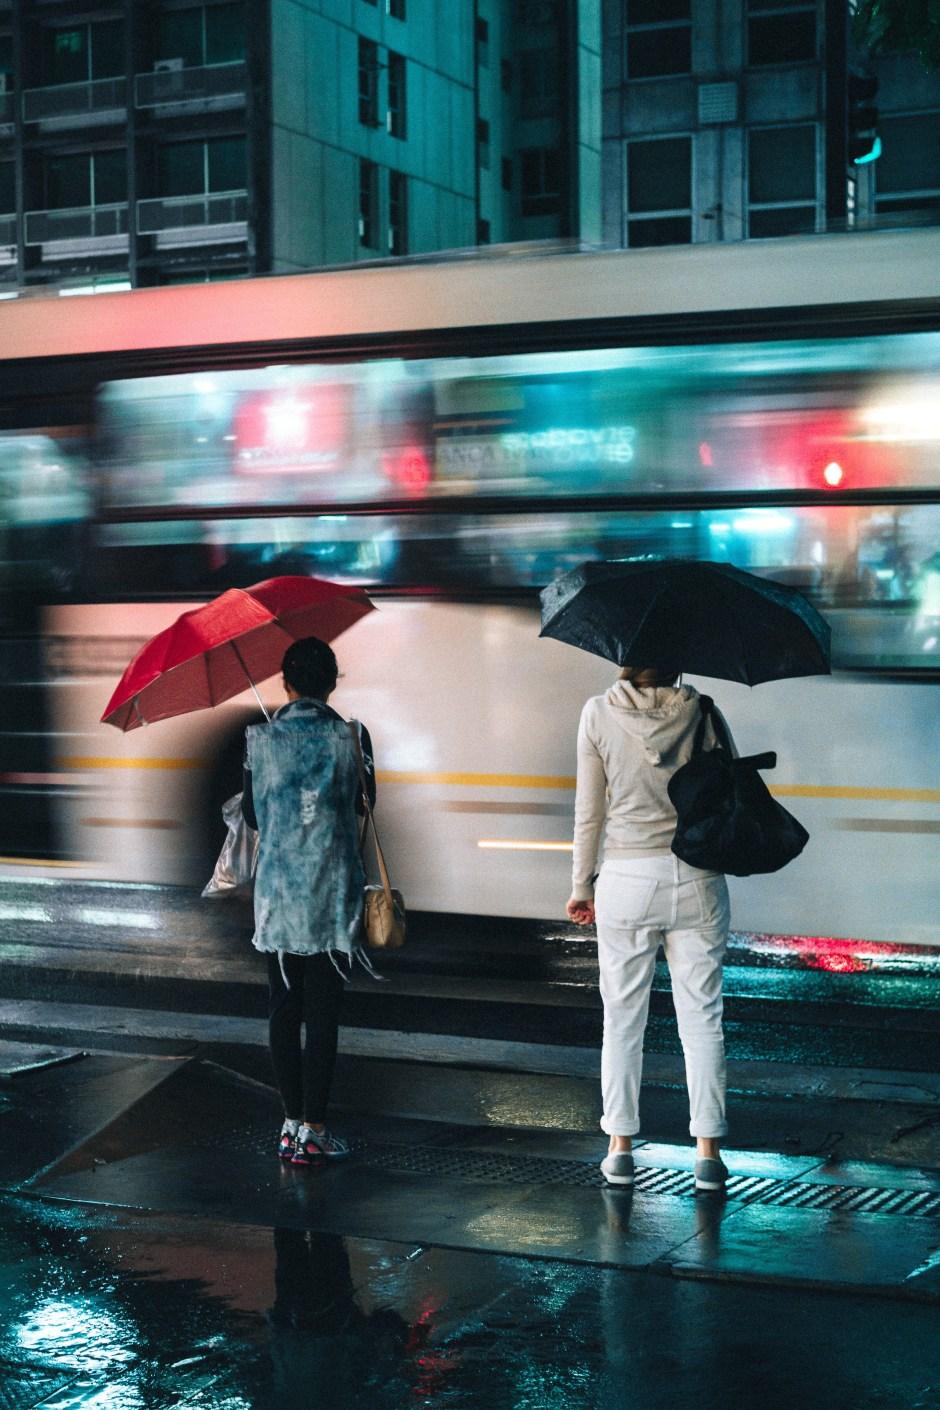 Neon Rain | Poem by Linda J Wolff